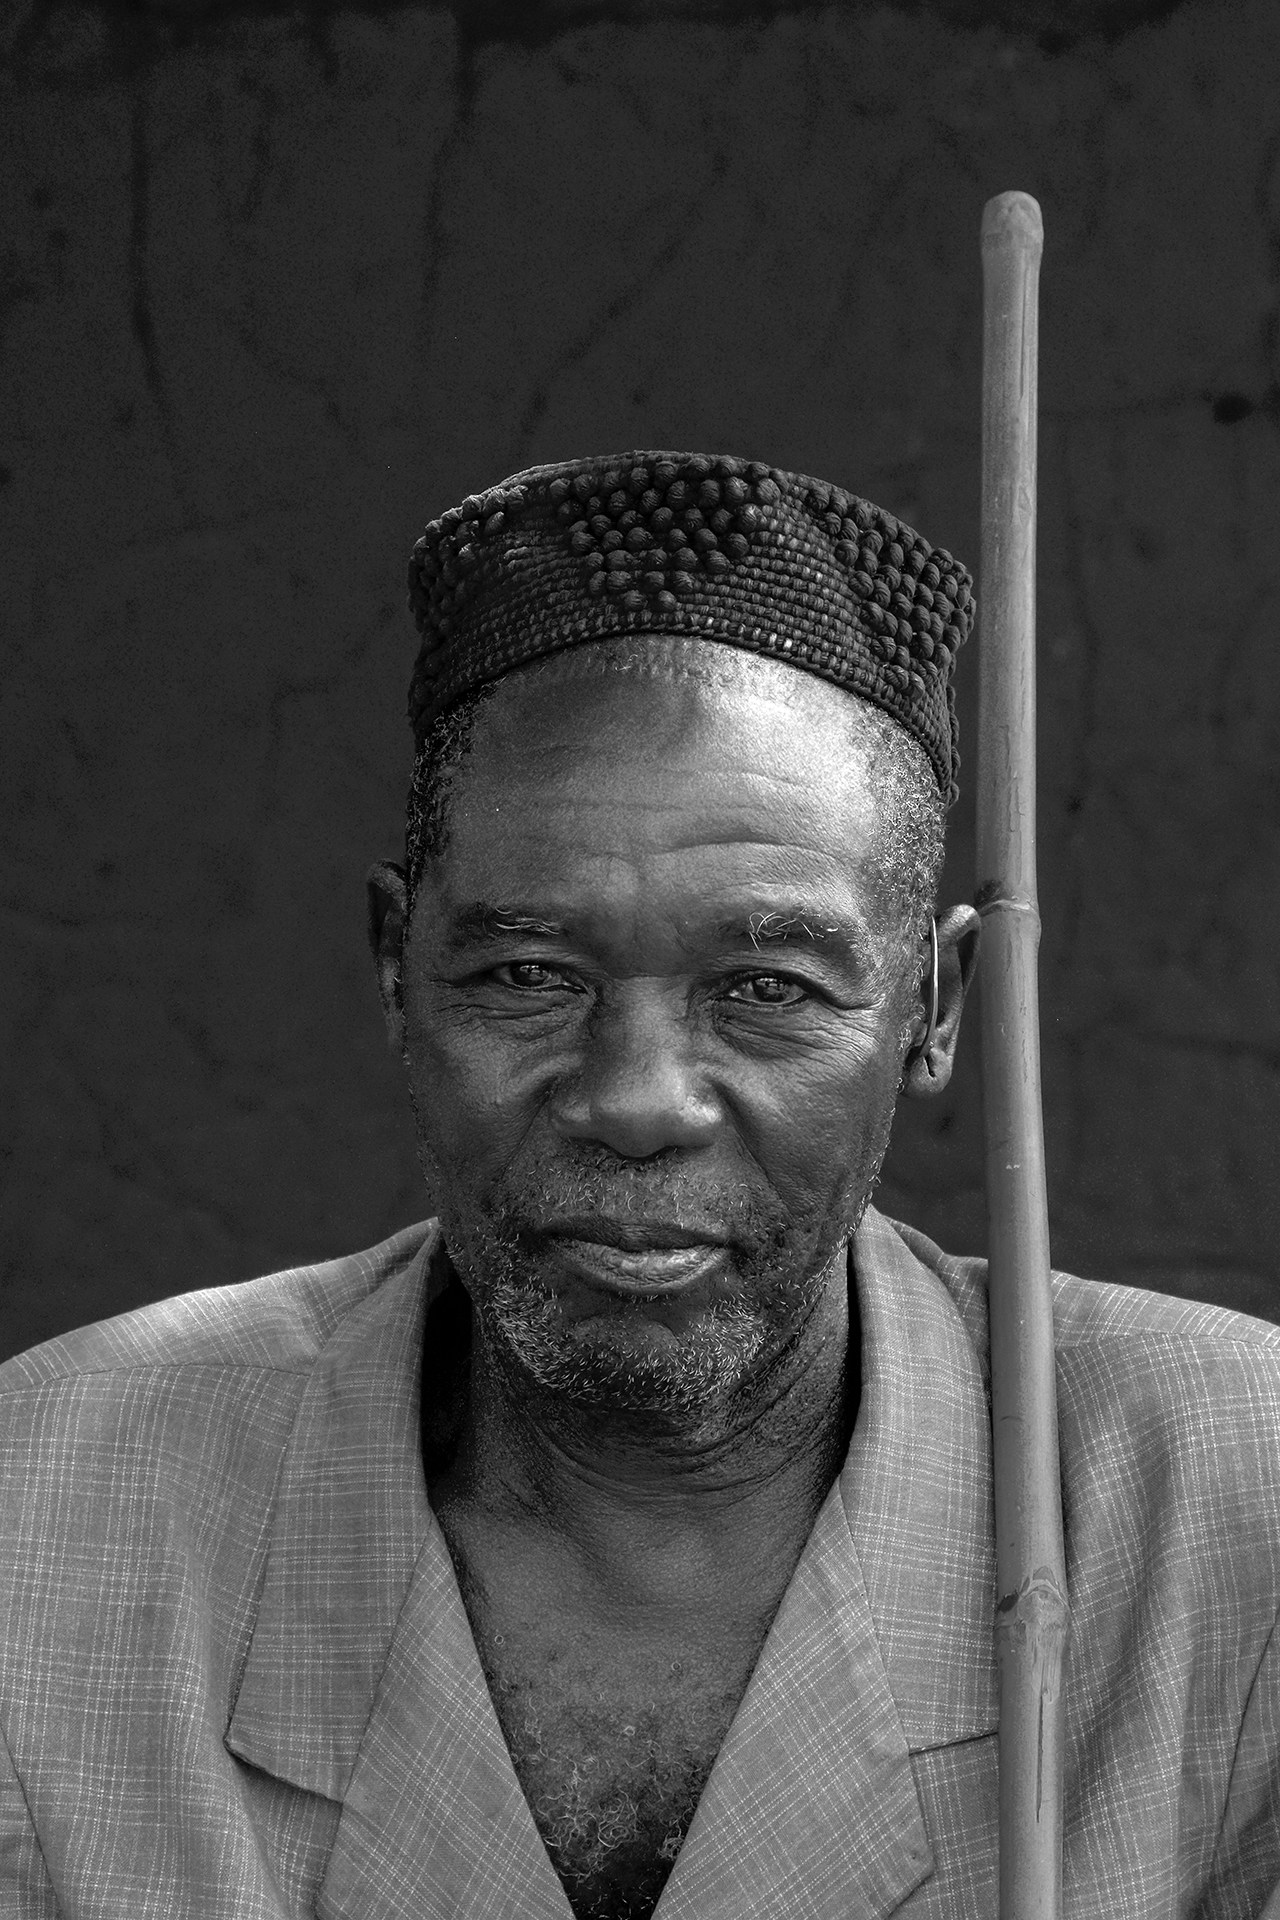 Le chef du village de KOUMI. 2014, KOUMI, région de BOBO DIOULASSO, Burkina Faso